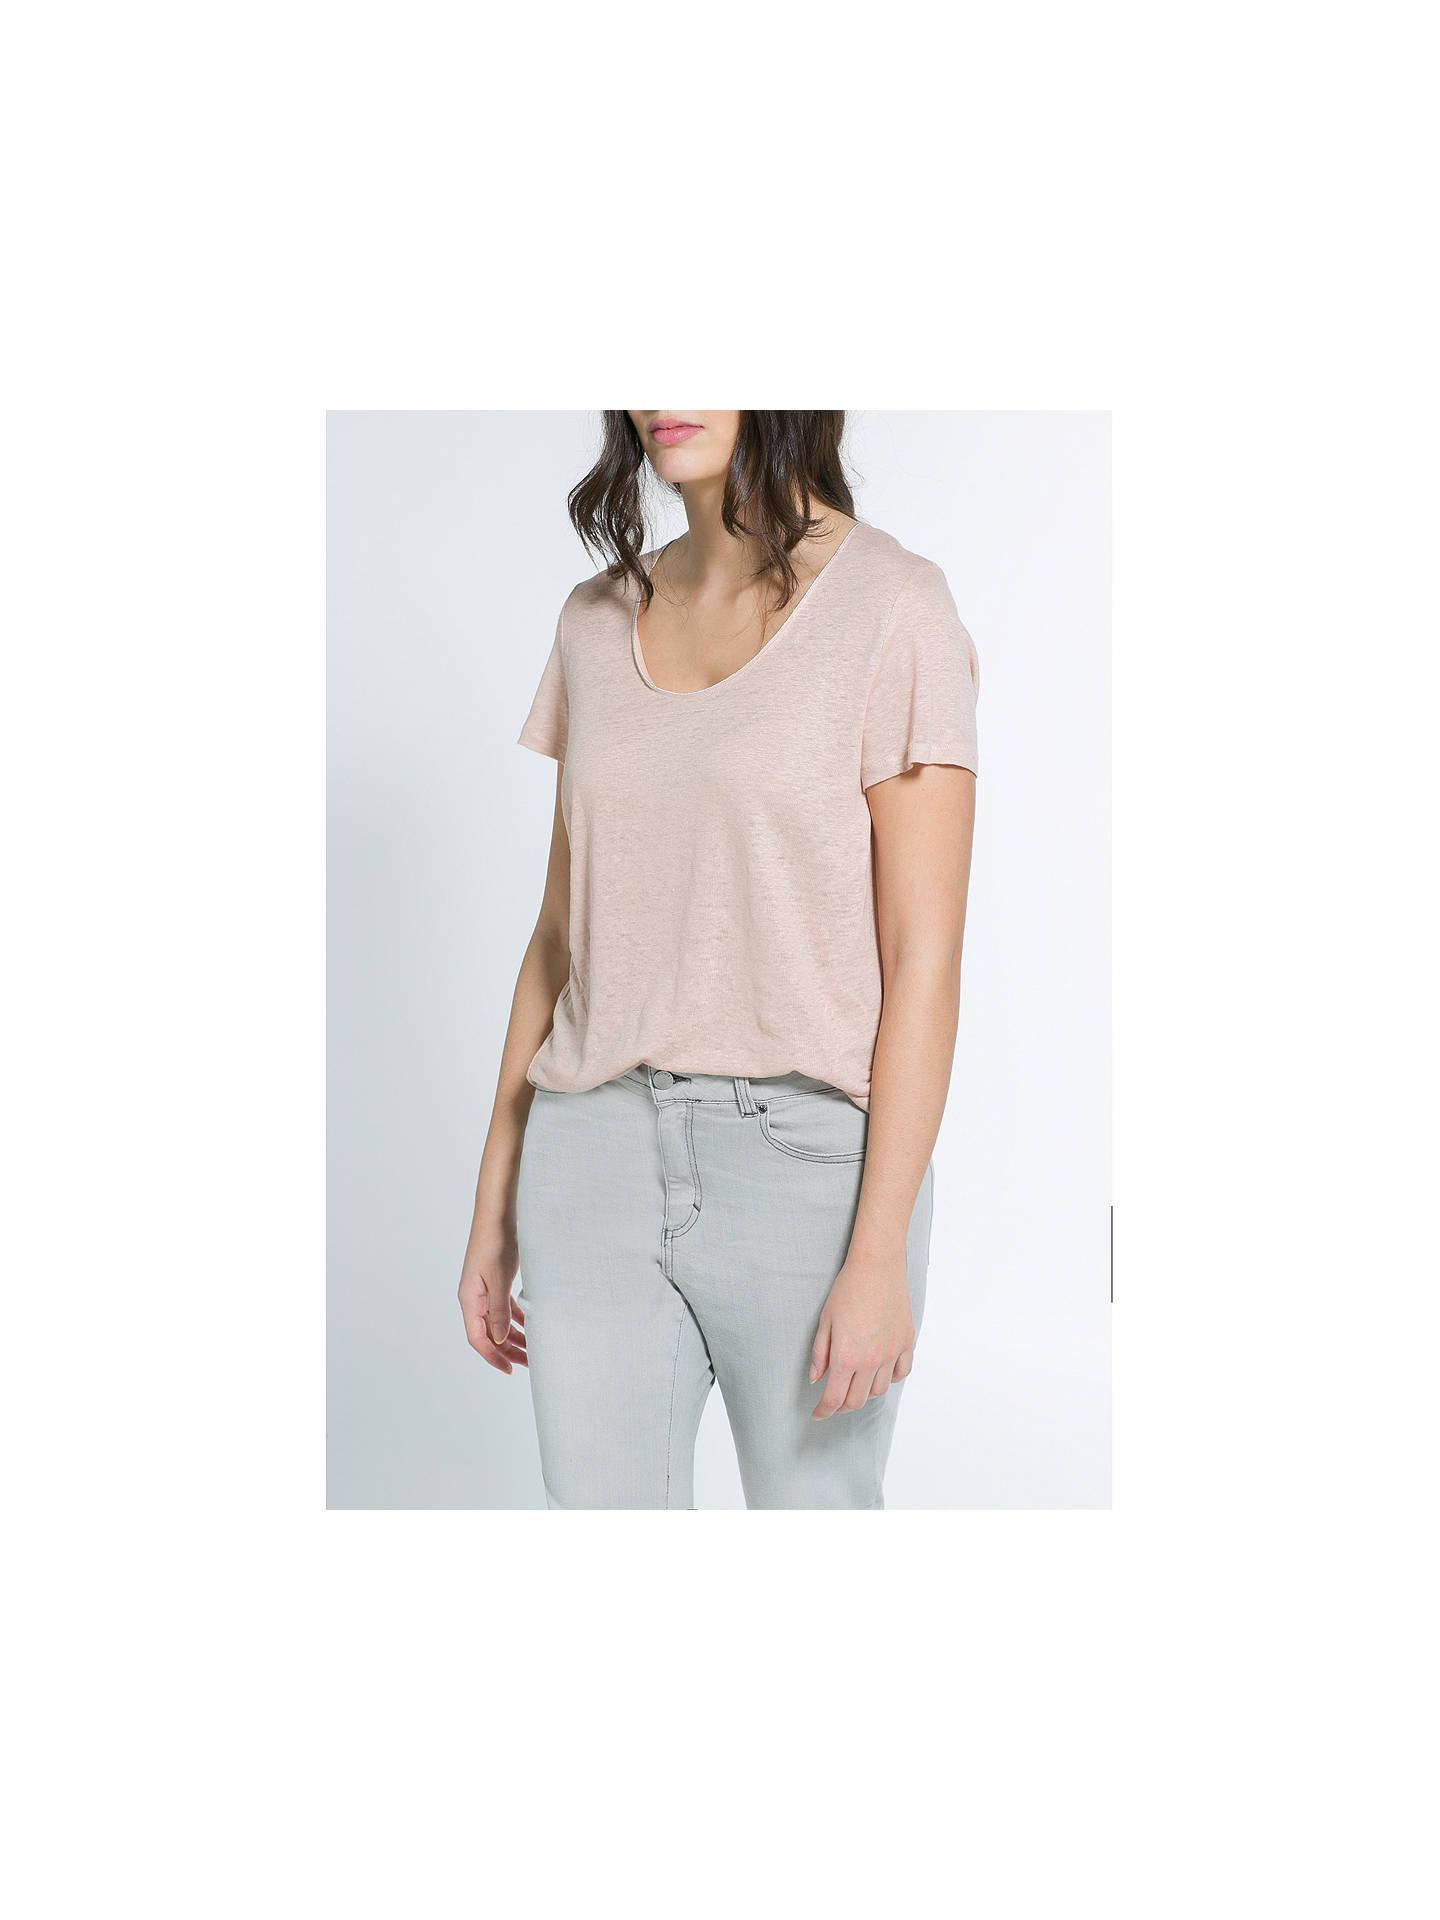 93bfc3c5123 Violeta by Mango Linen T-Shirt at John Lewis   Partners